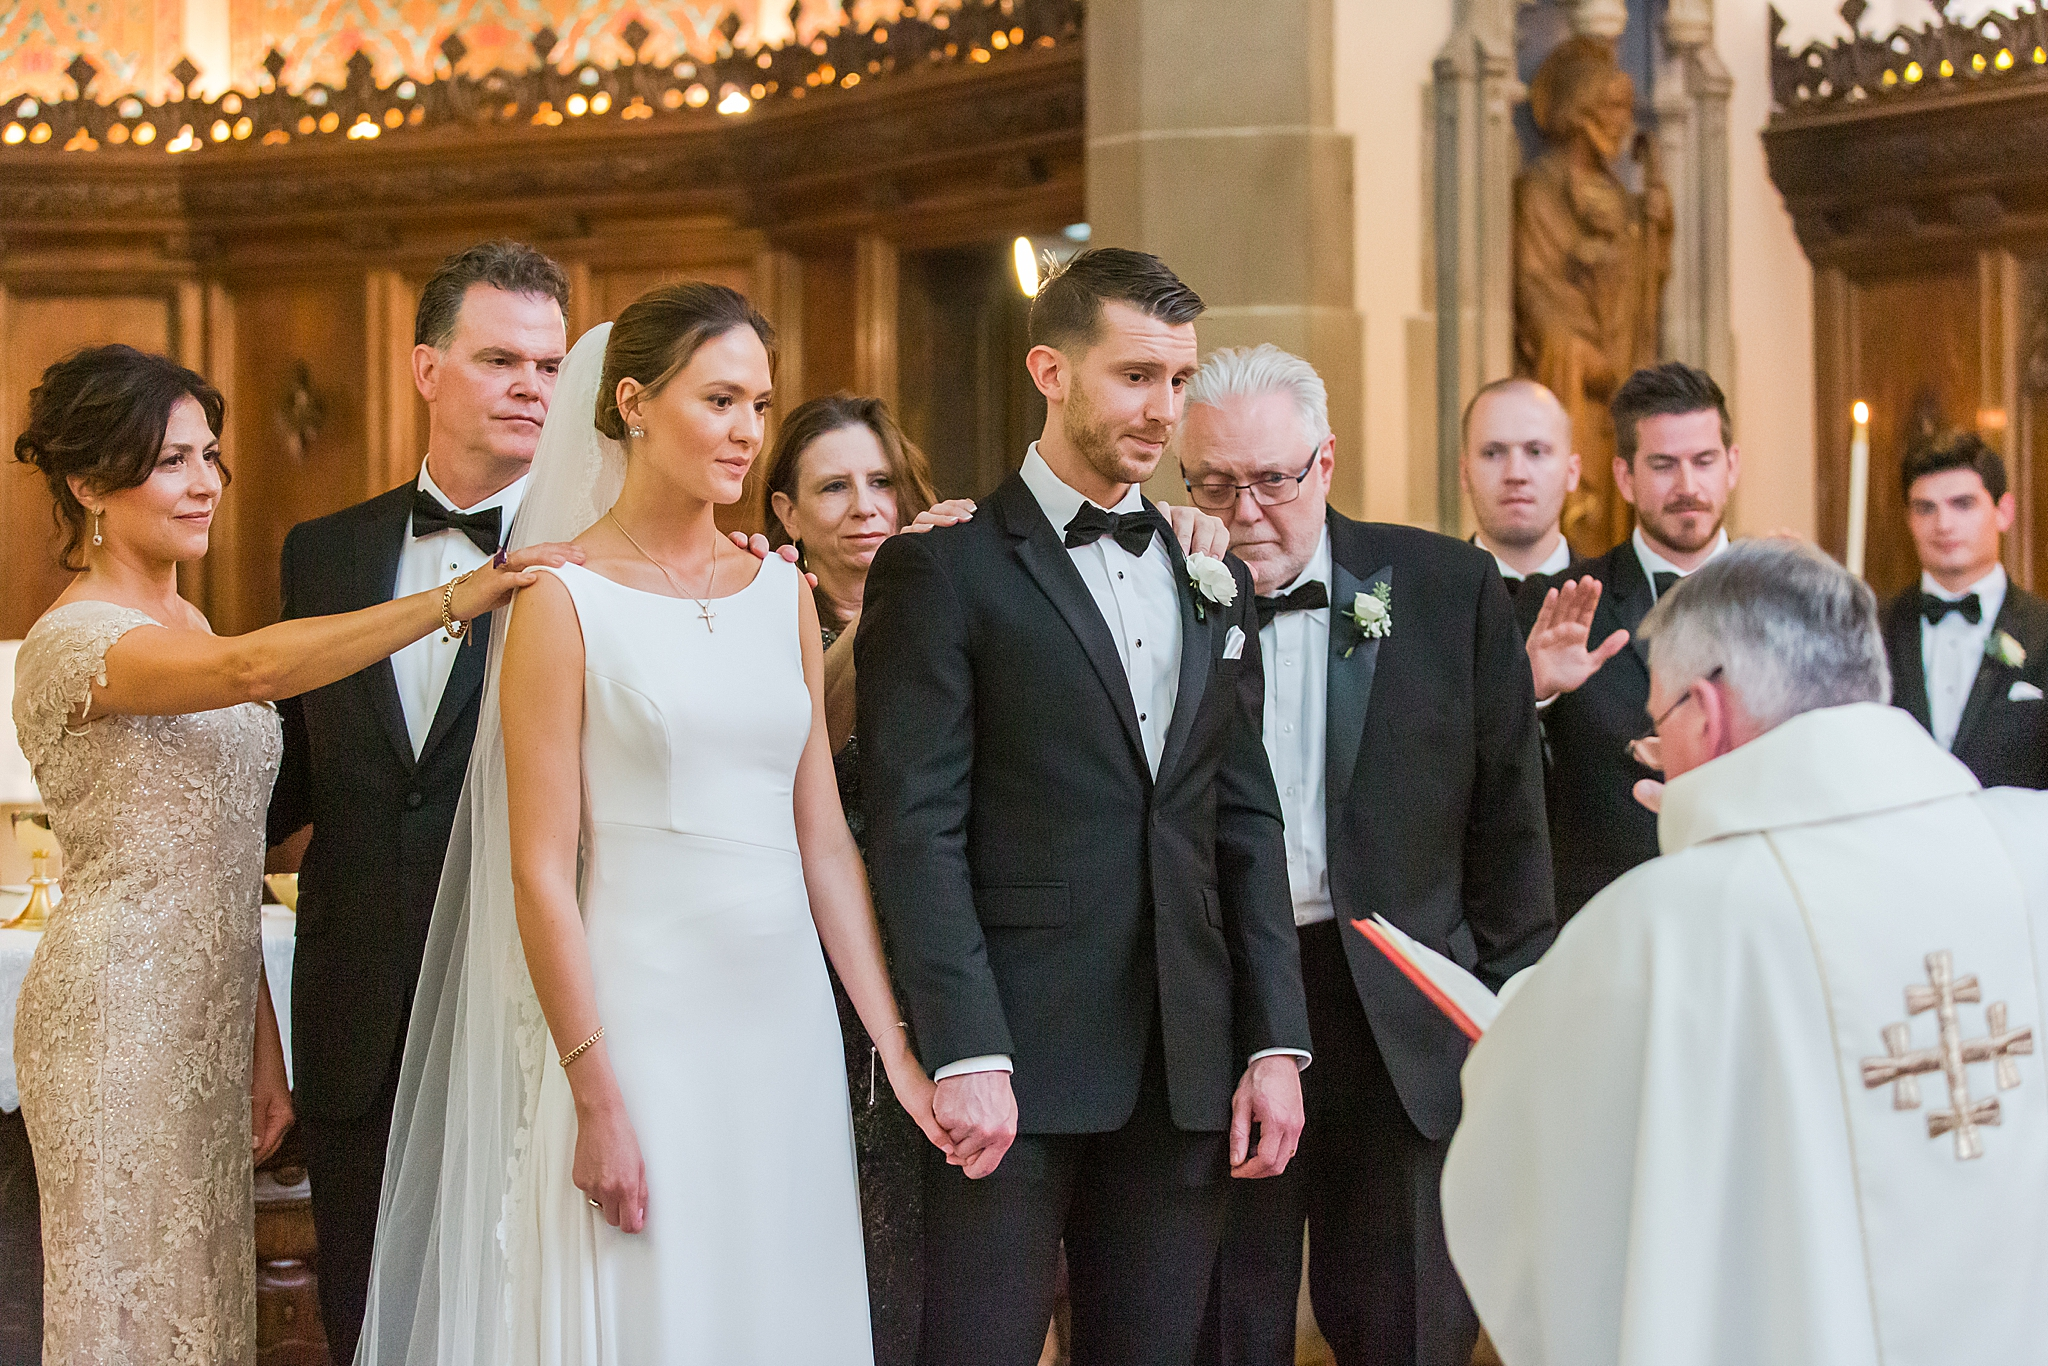 detroit-wedding-photographer-grosse-pointe-academy-chapel-detroit-golf-club-wedding-carly-matt-by-courtney-carolyn-photography_0045.jpg